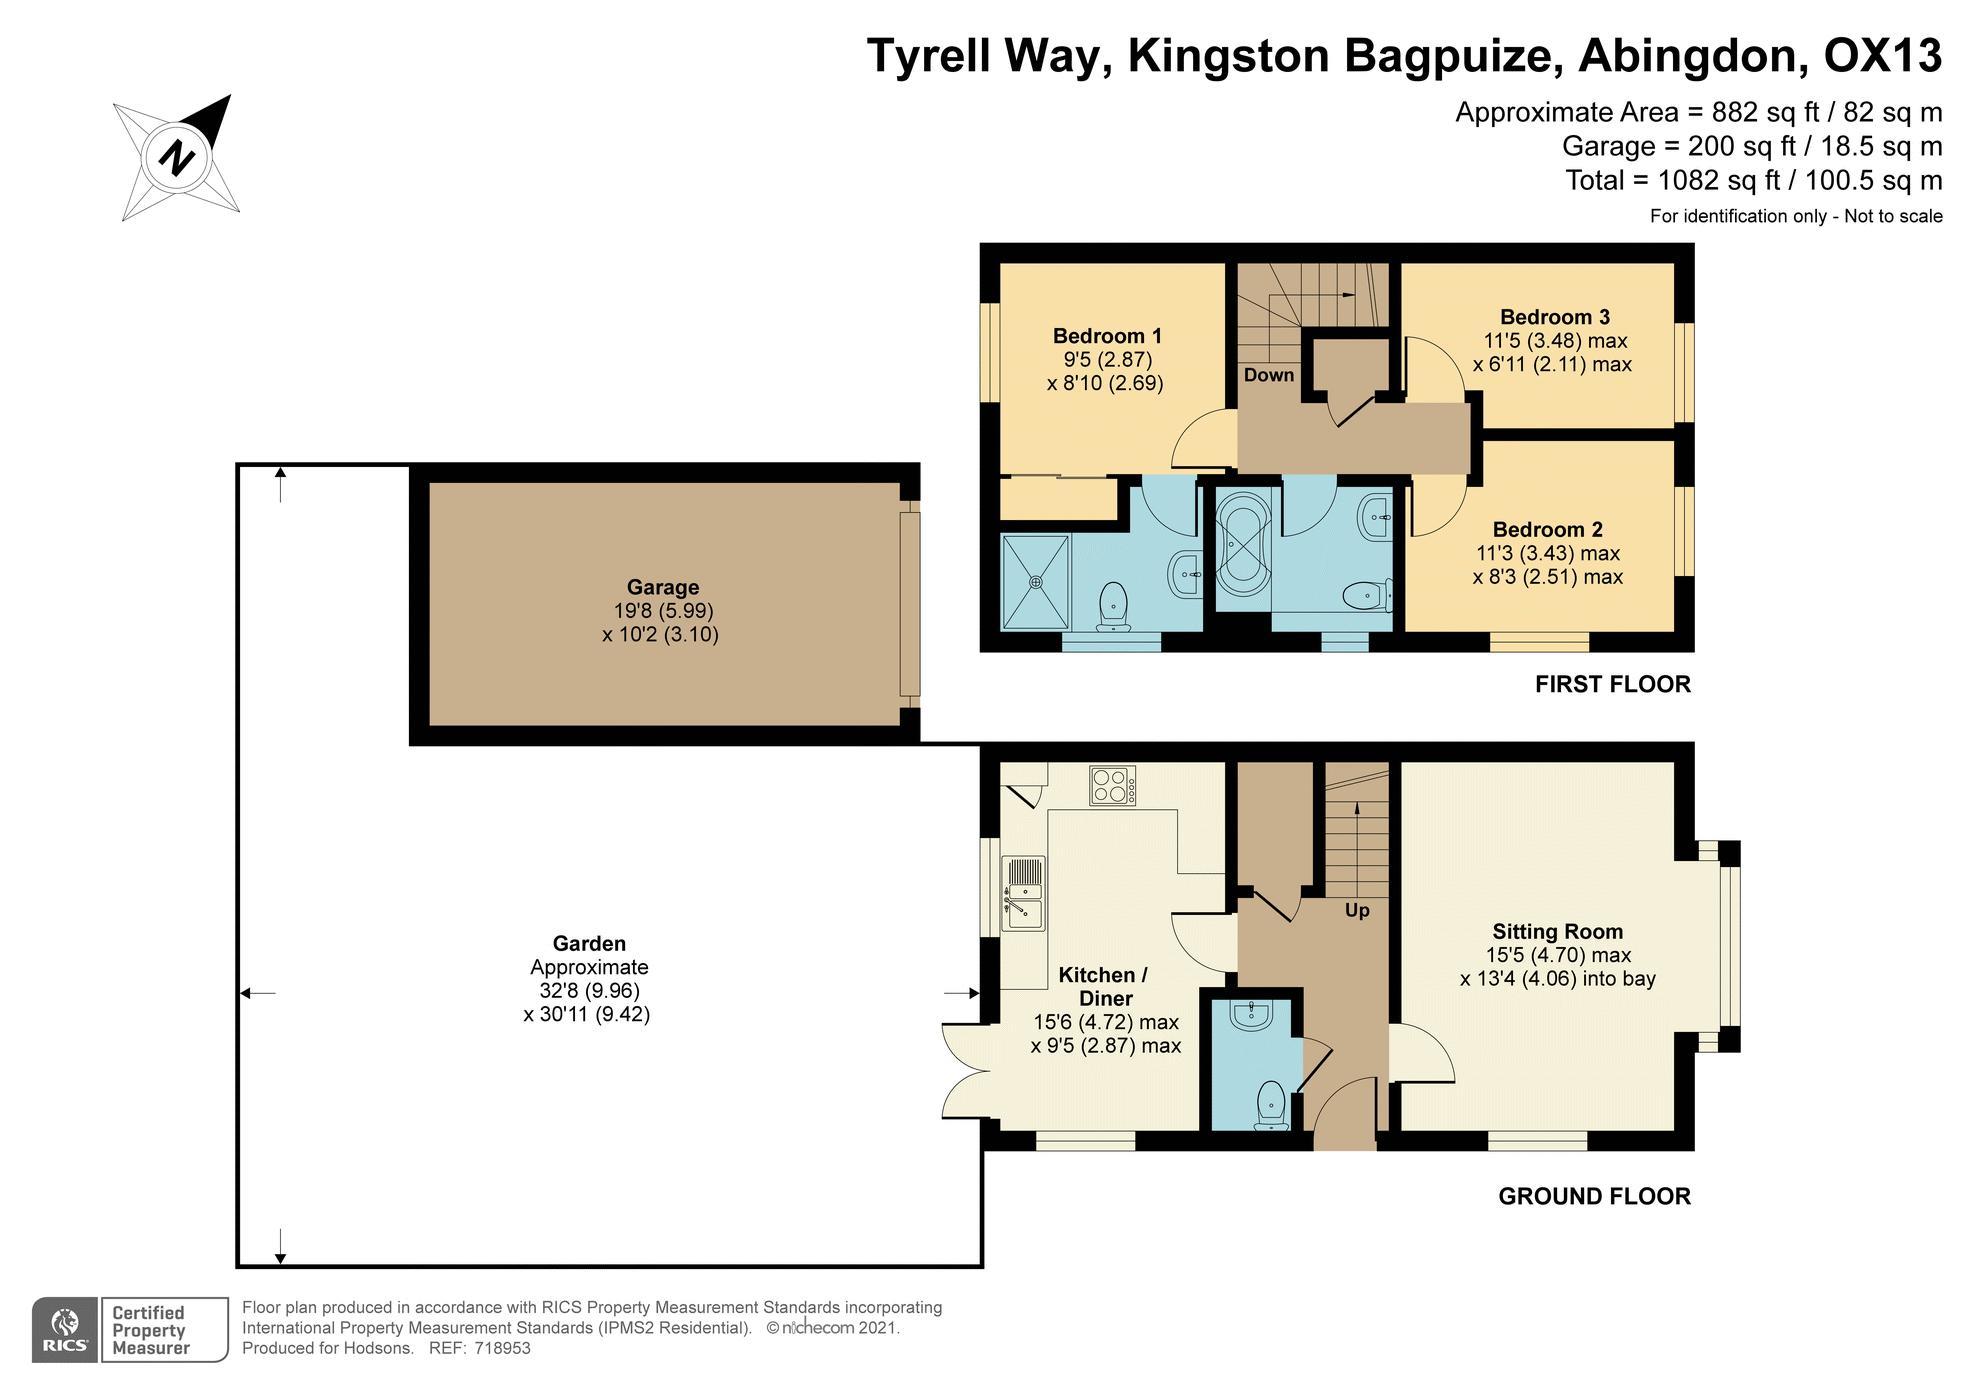 Tyrell Way Kingston Bagpuize